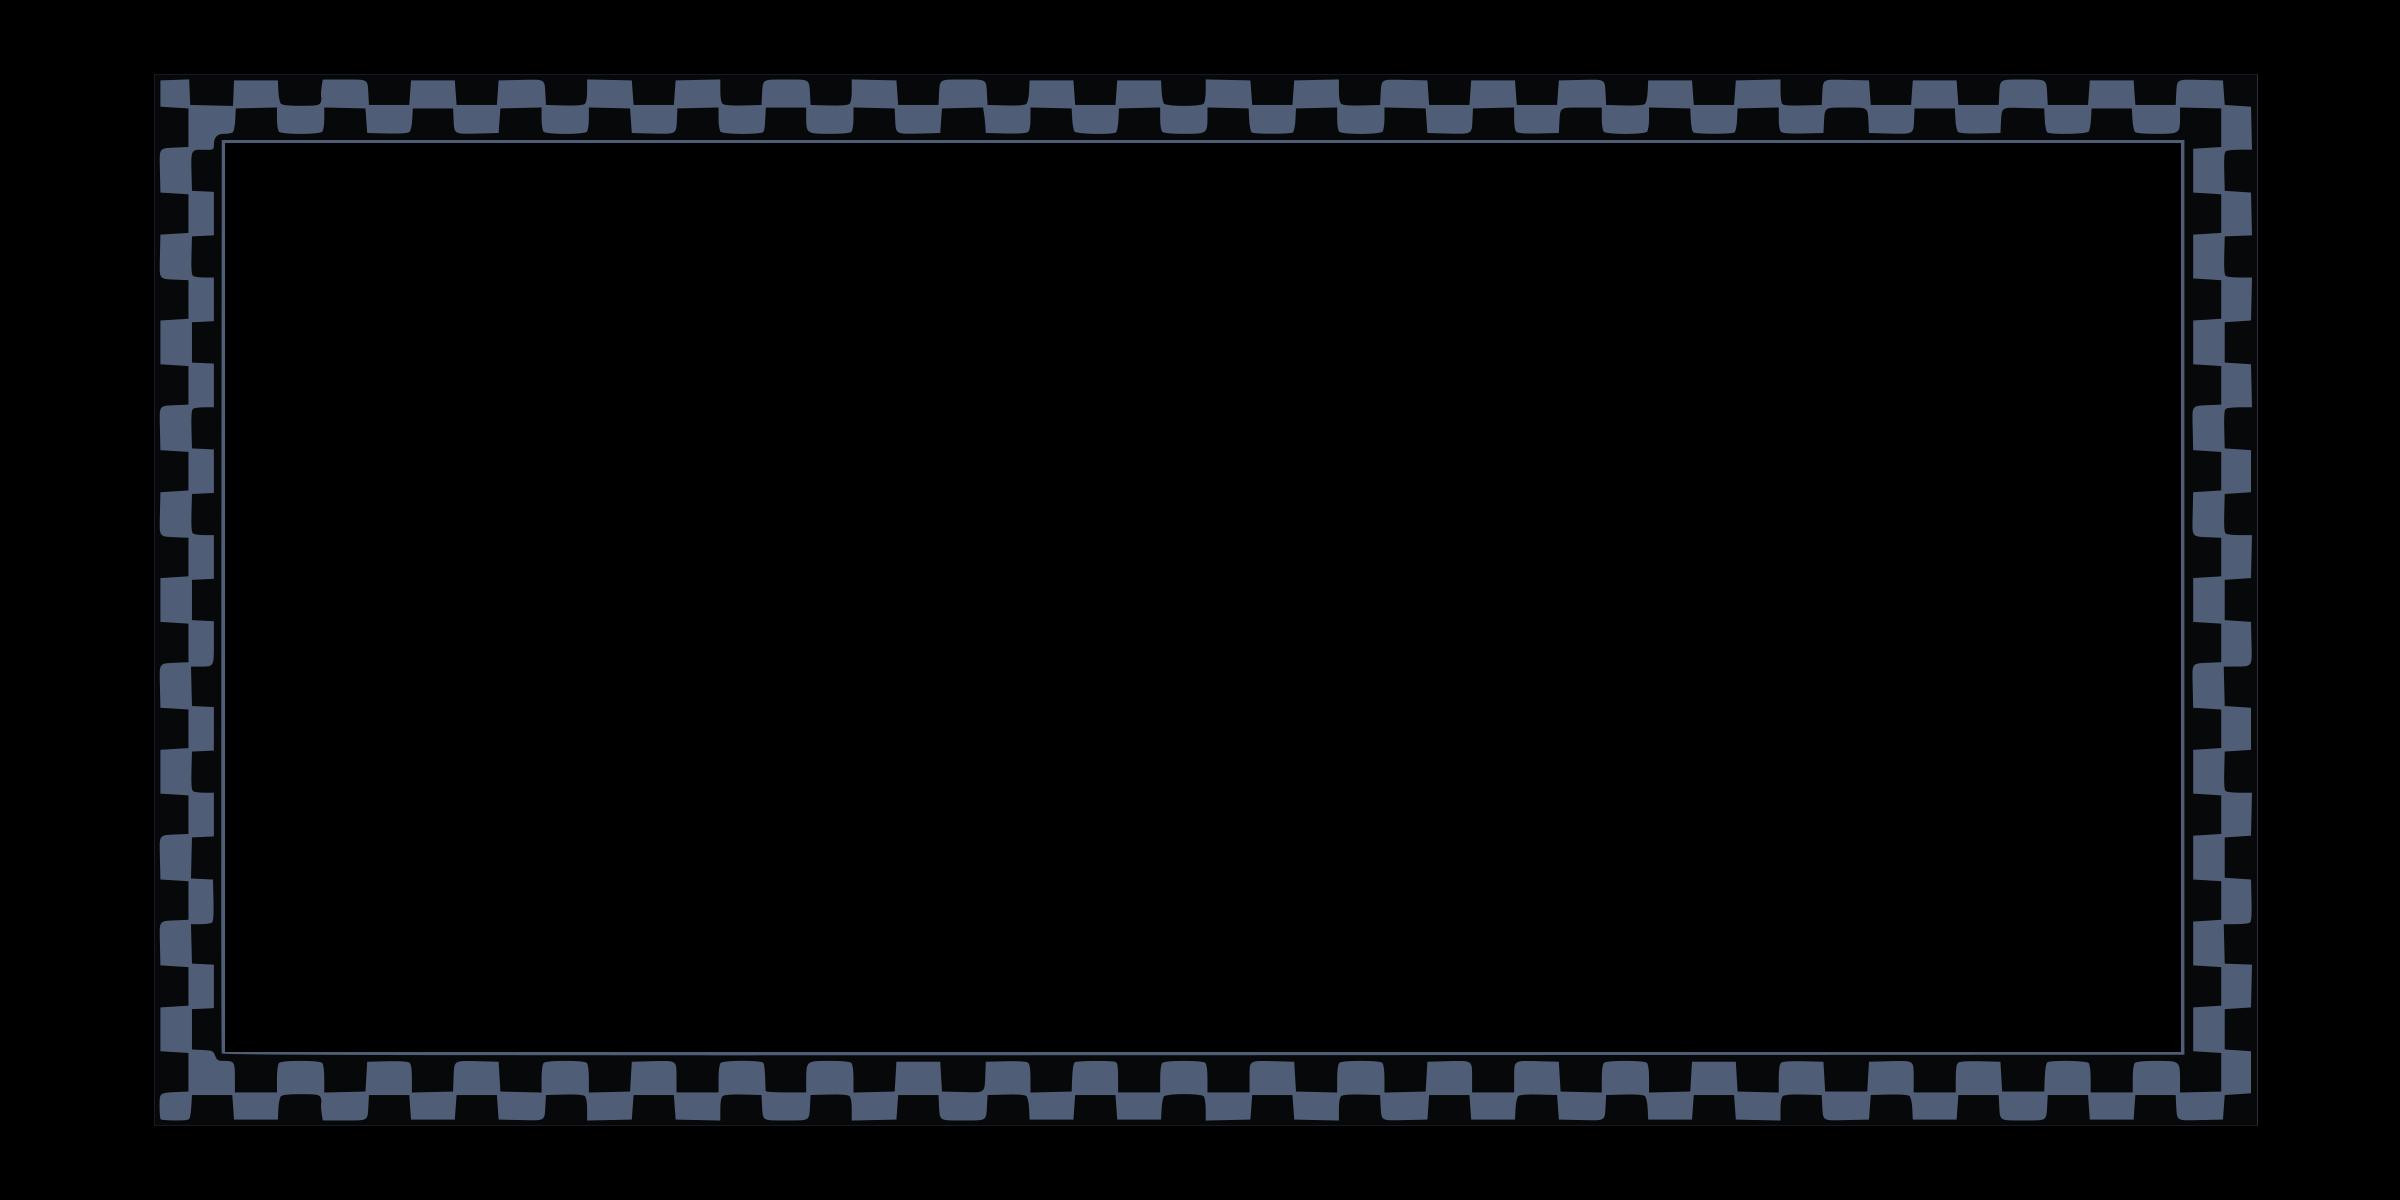 Cross border clipart download Clipart - worldlabel.com border dark blue Black checkered 4x2 download